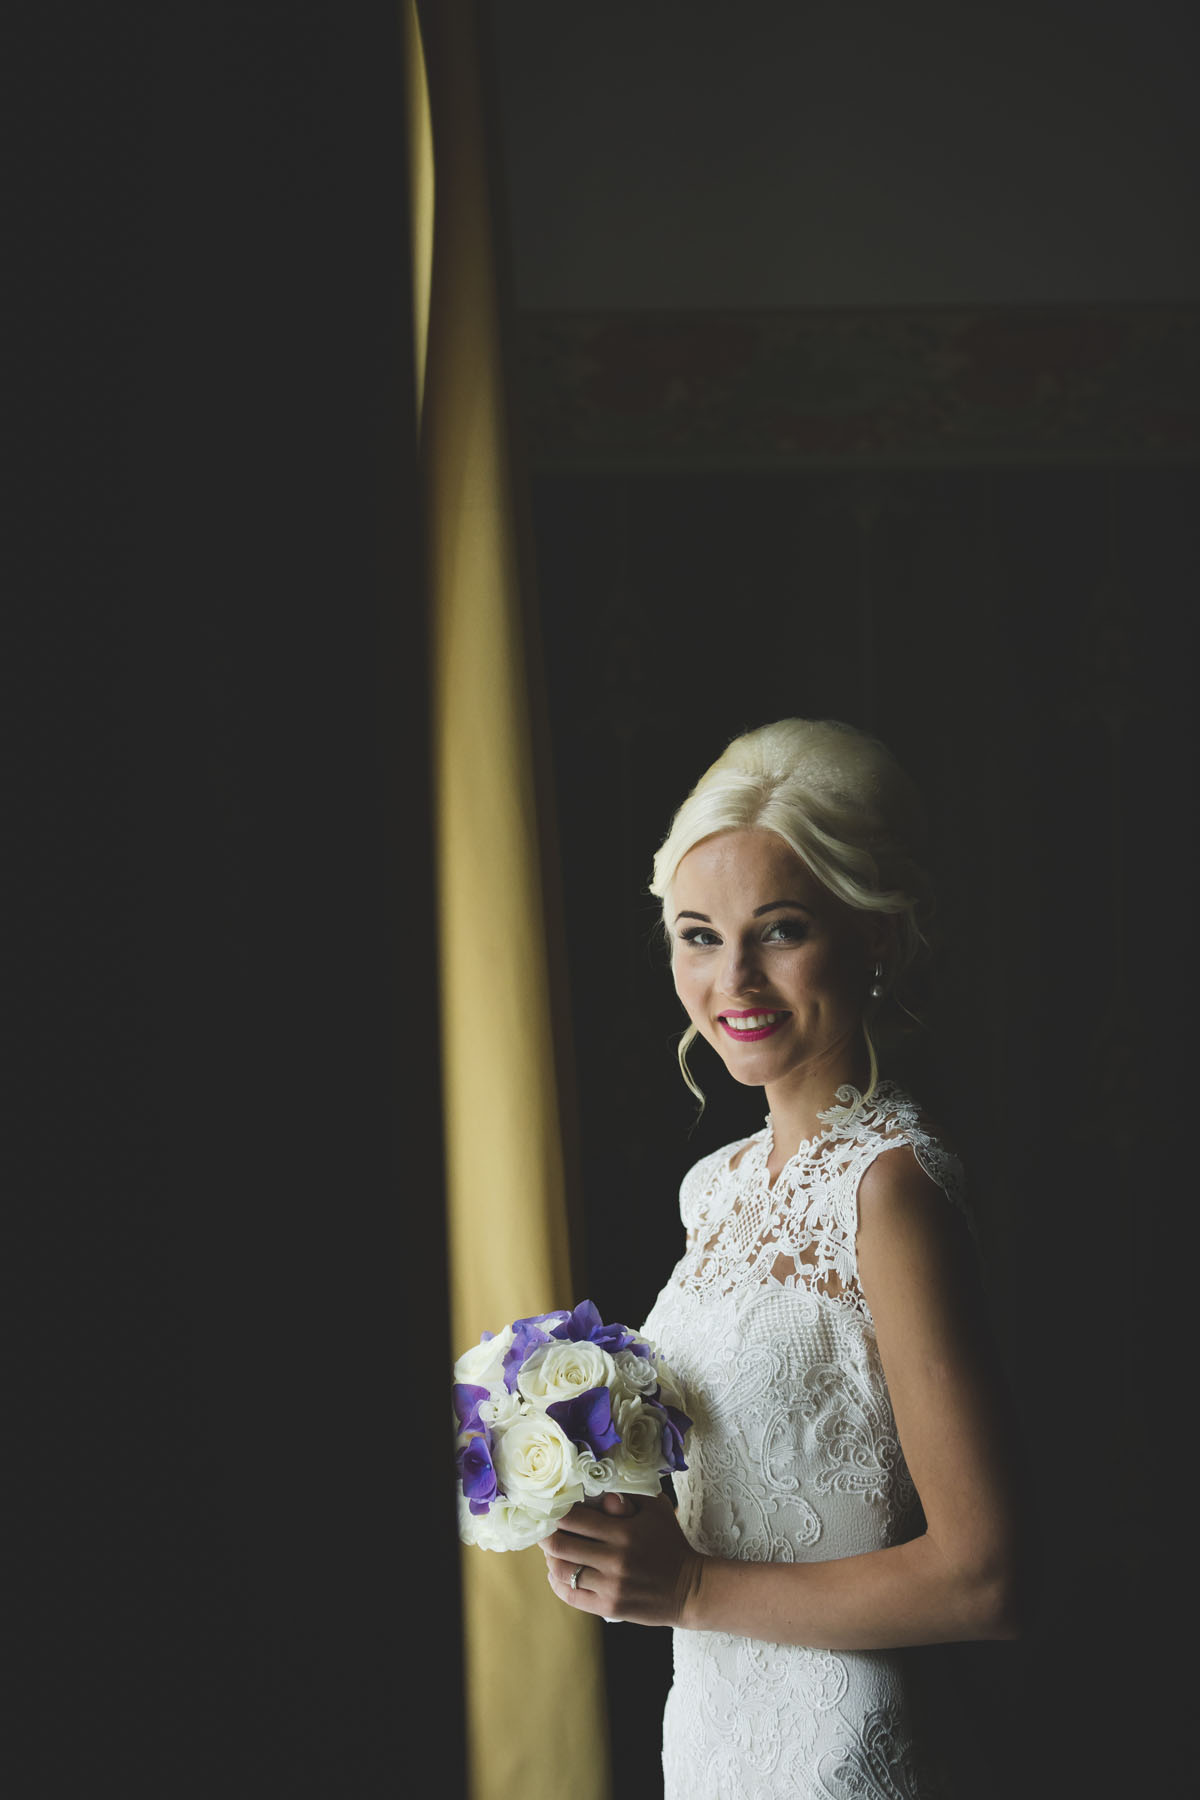 wedding-photos-047-best-wedding-photographer.jpg